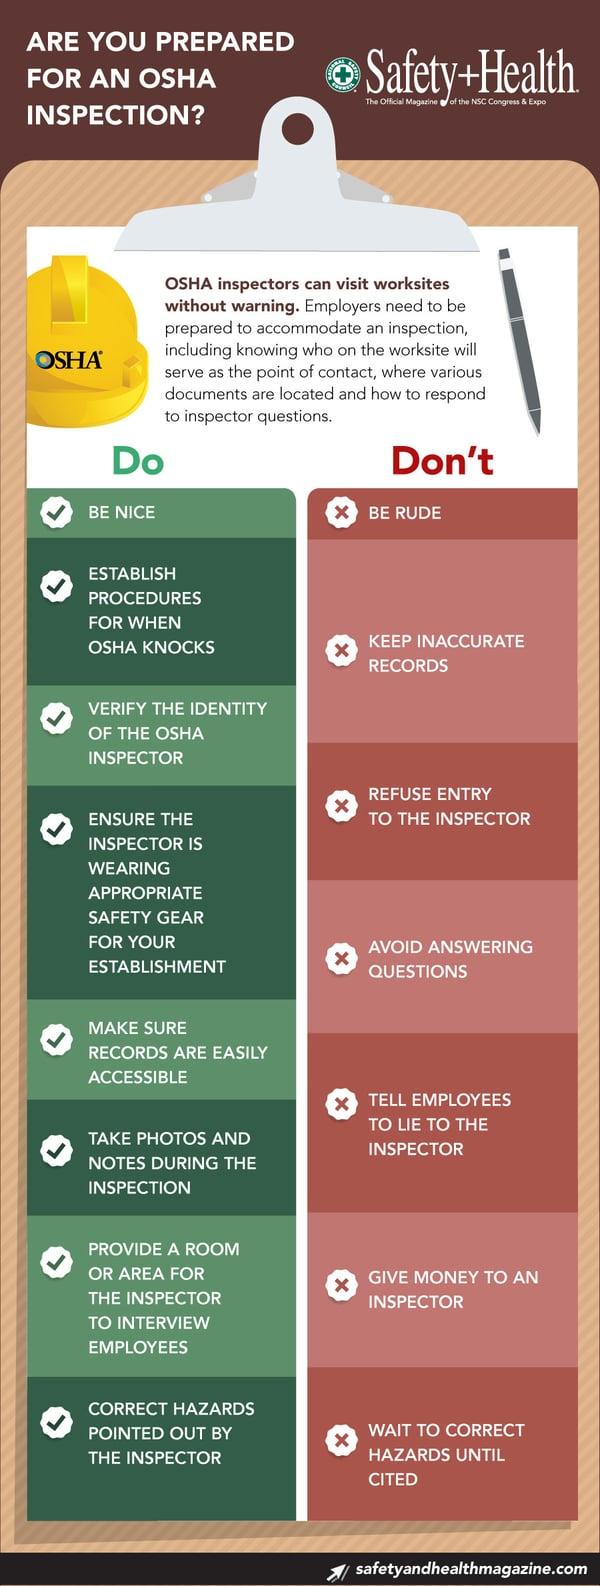 OSHA-inspections-infographic